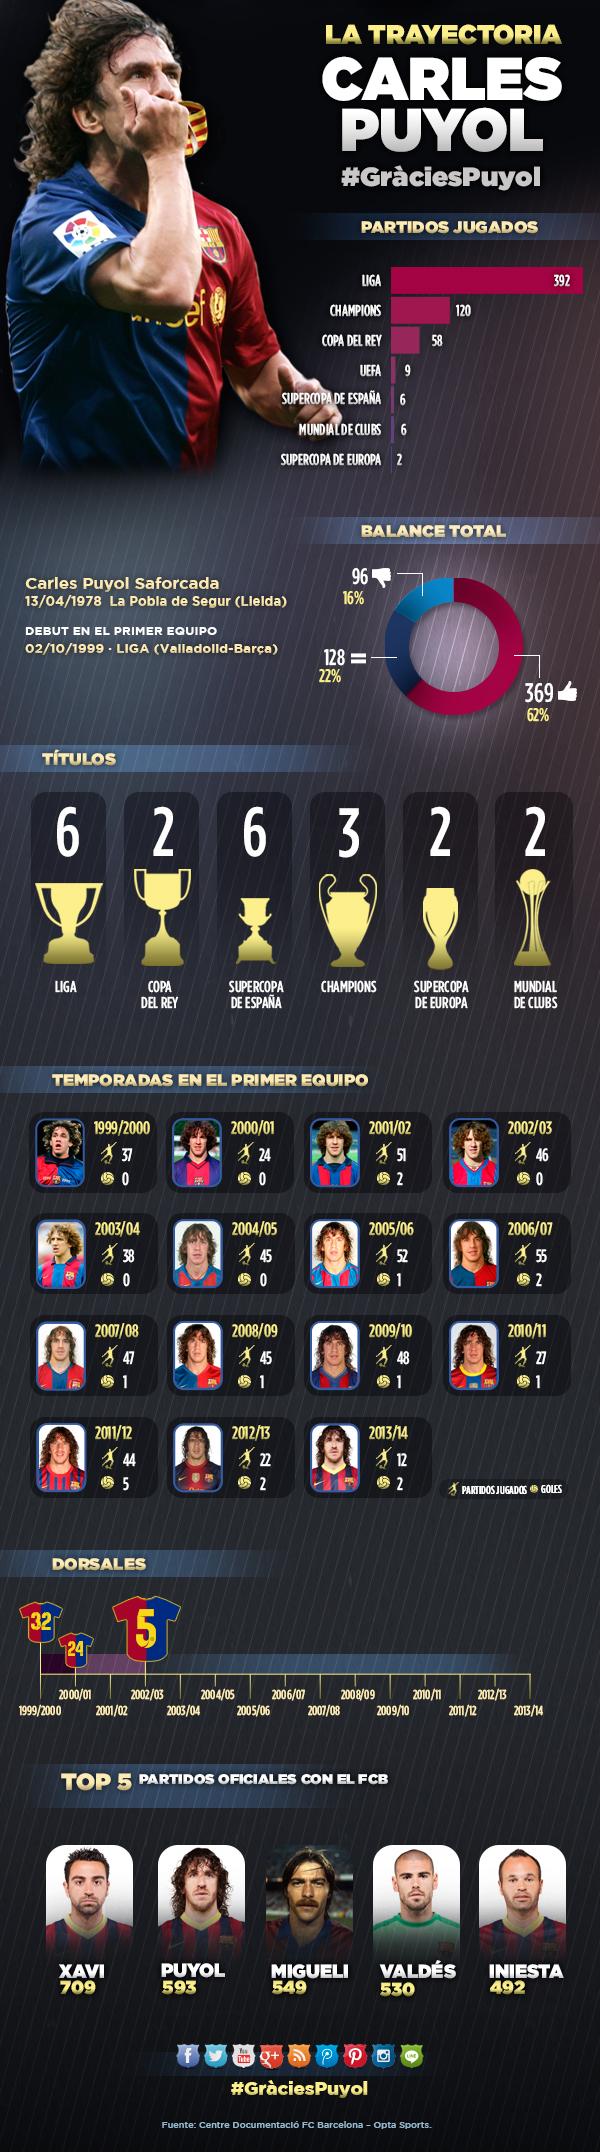 Infográfico Carles Puyol